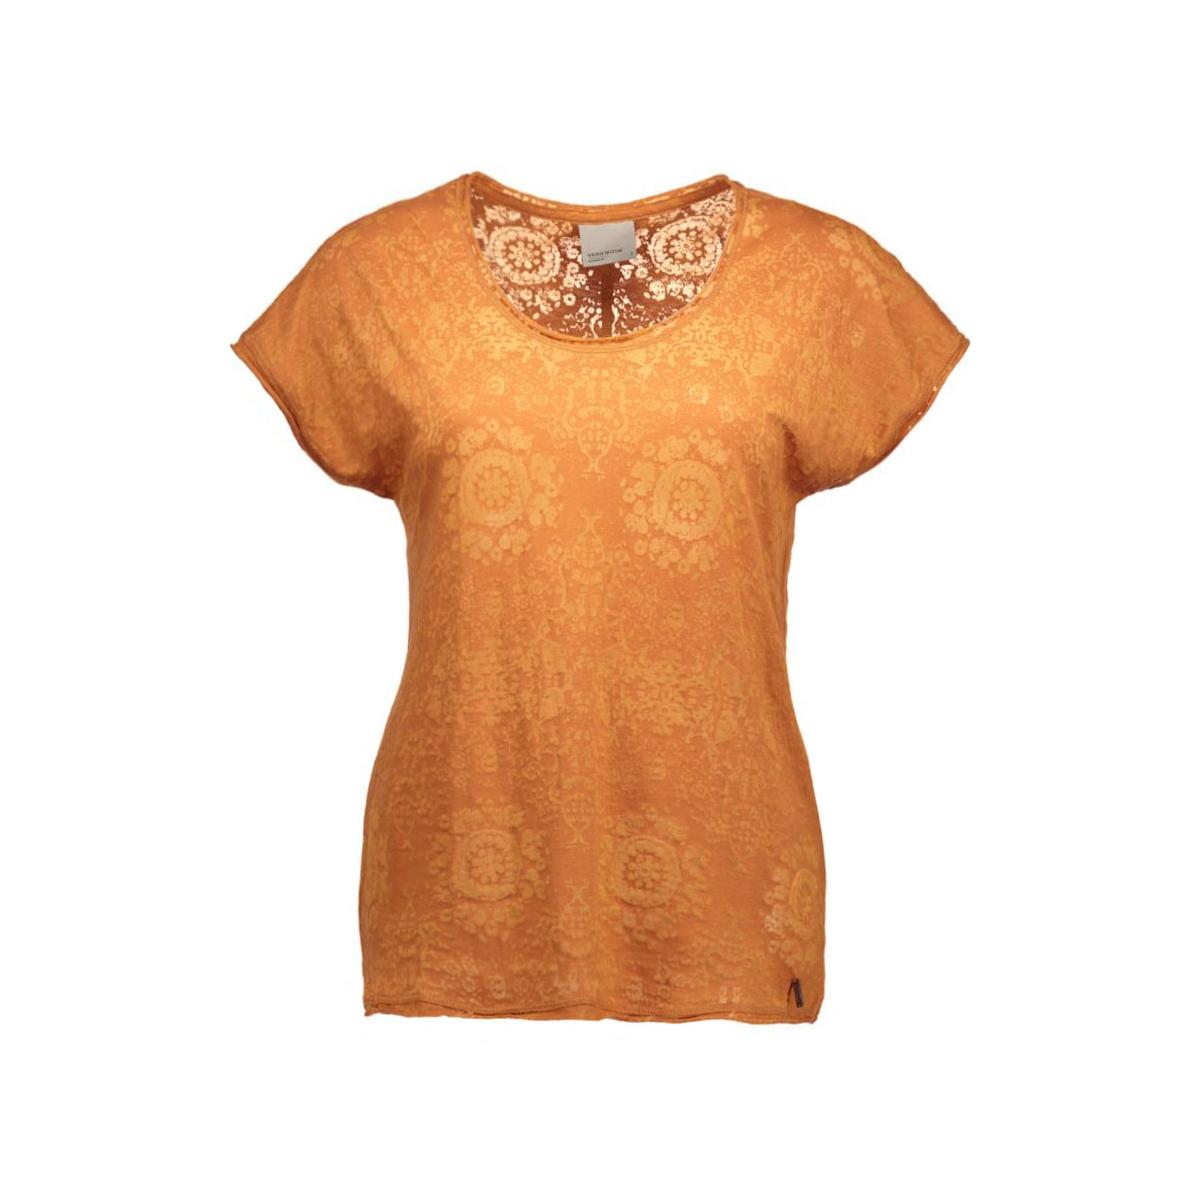 vmerin ss wide top a 10156067 vero moda t-shirt adobe